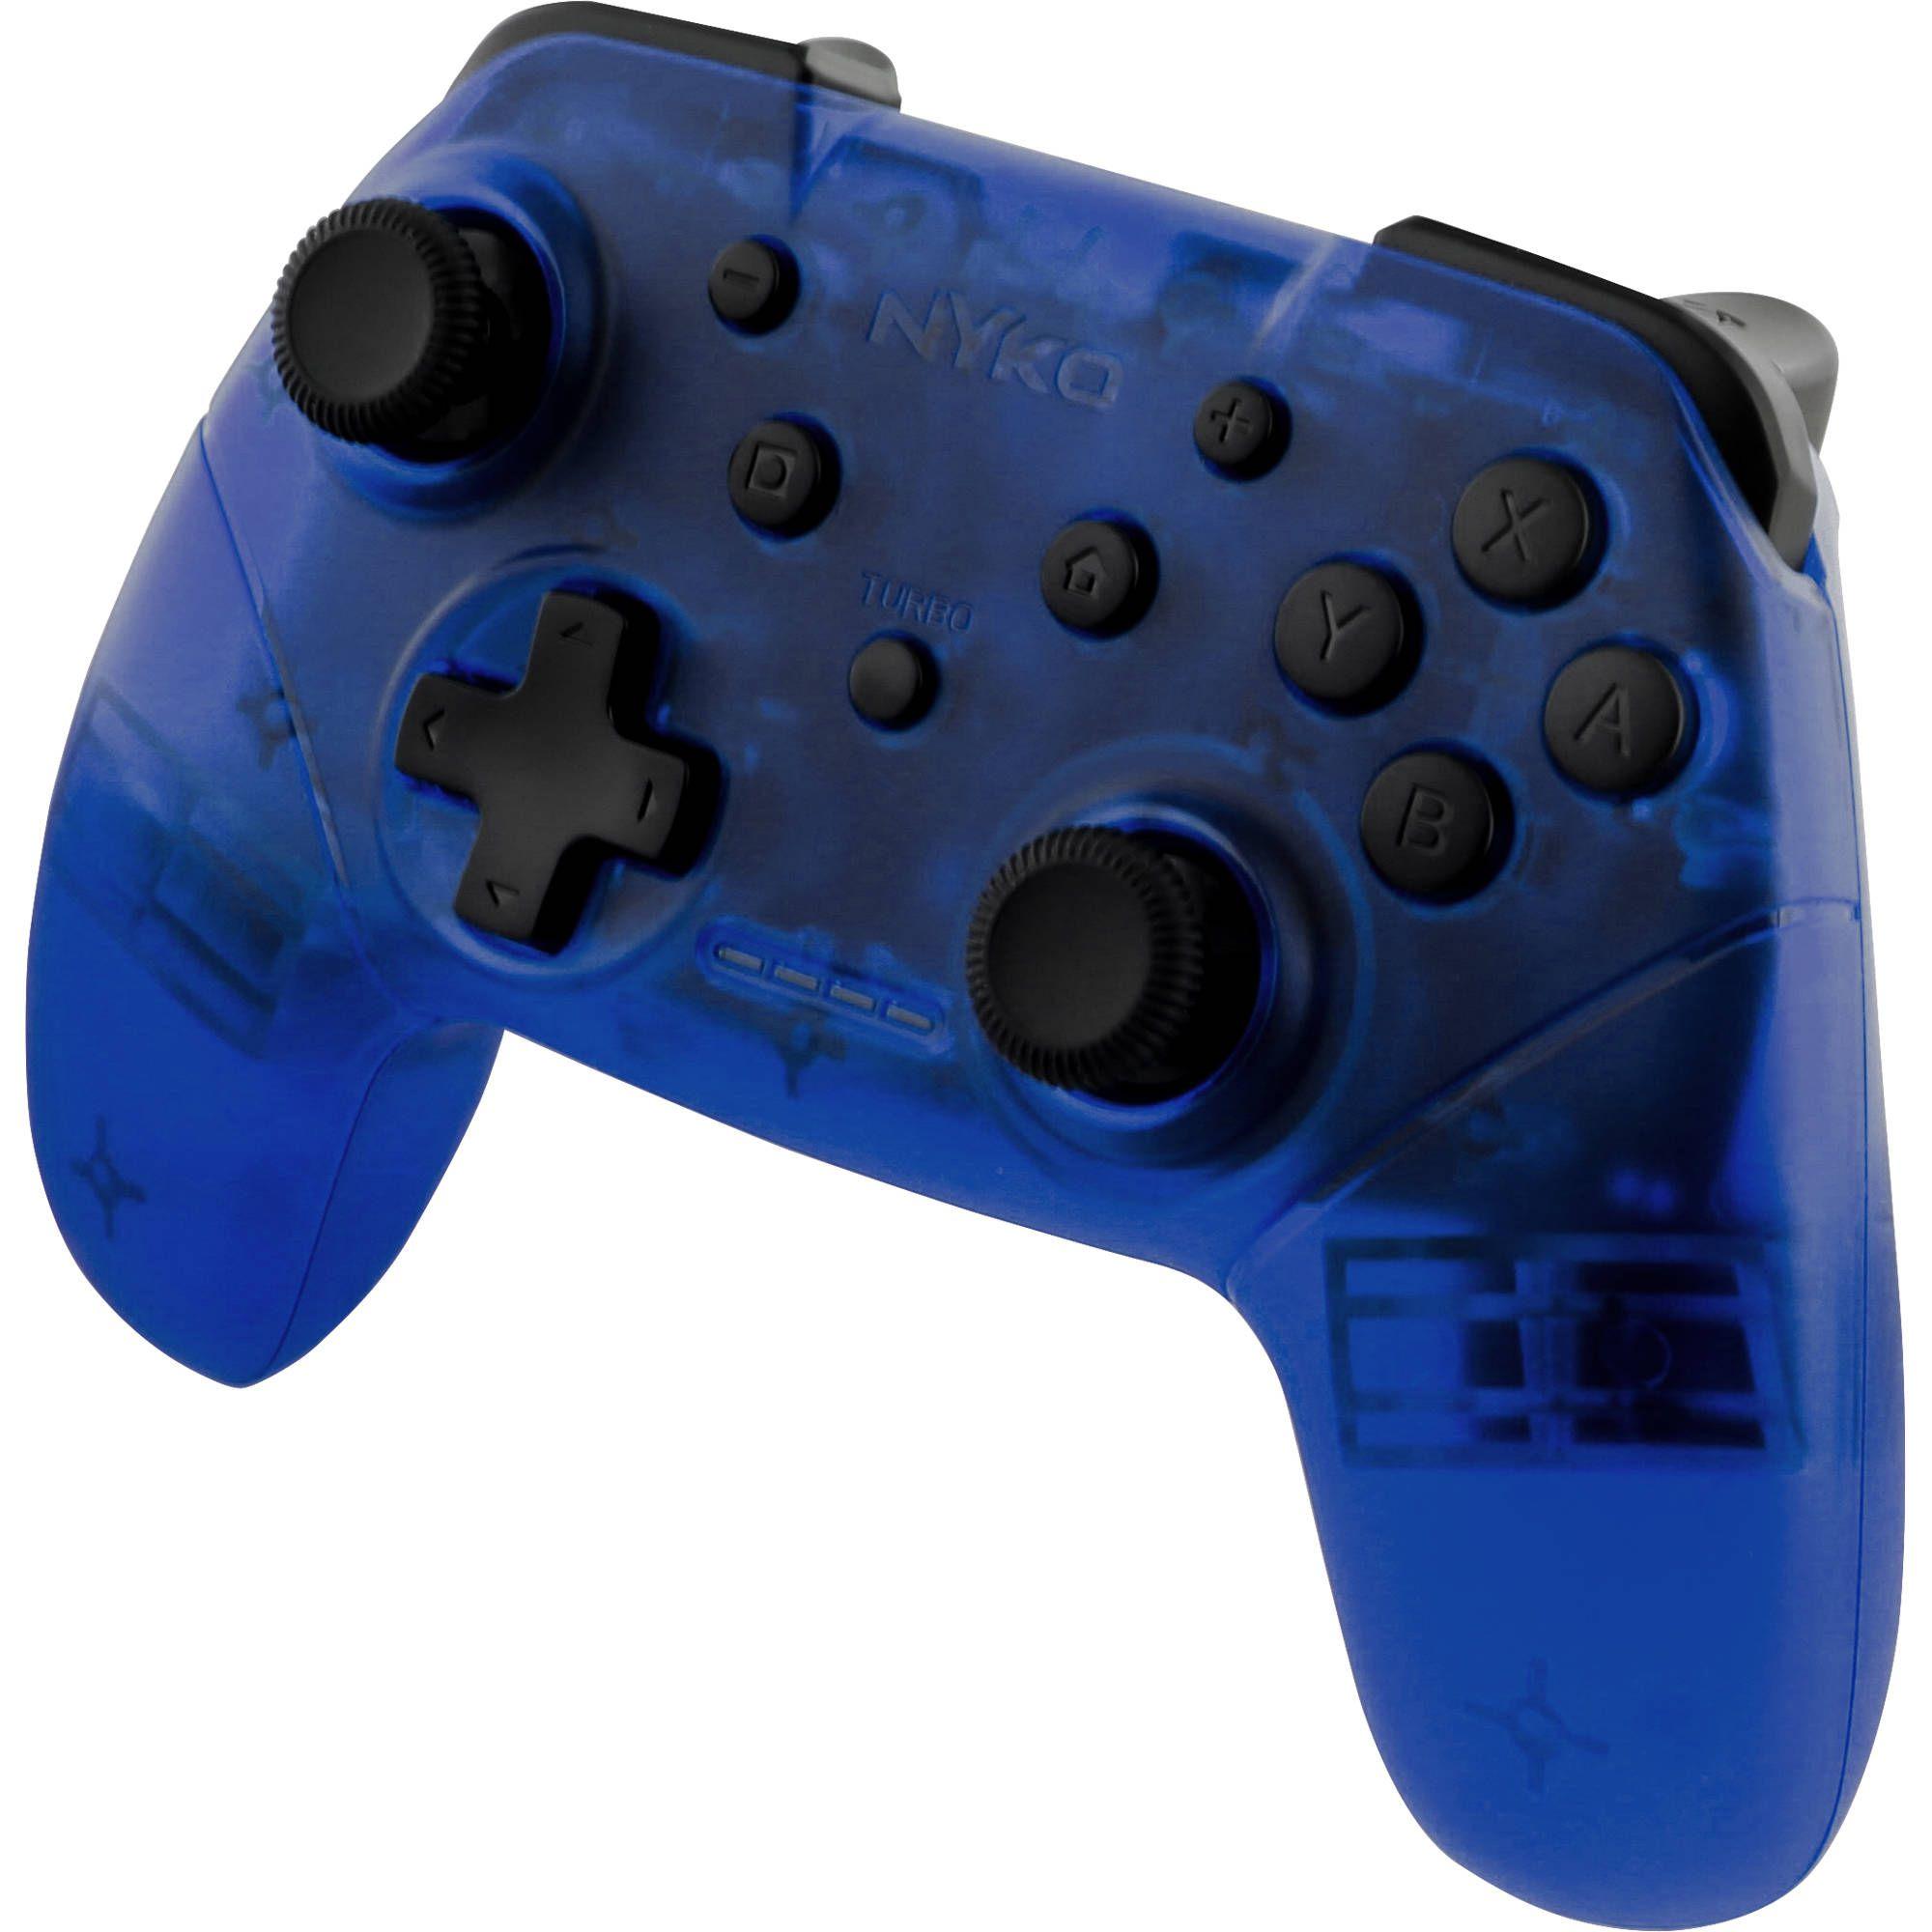 Controle Wireless Core Turbo Nyko - Nintendo Switch (Azul)